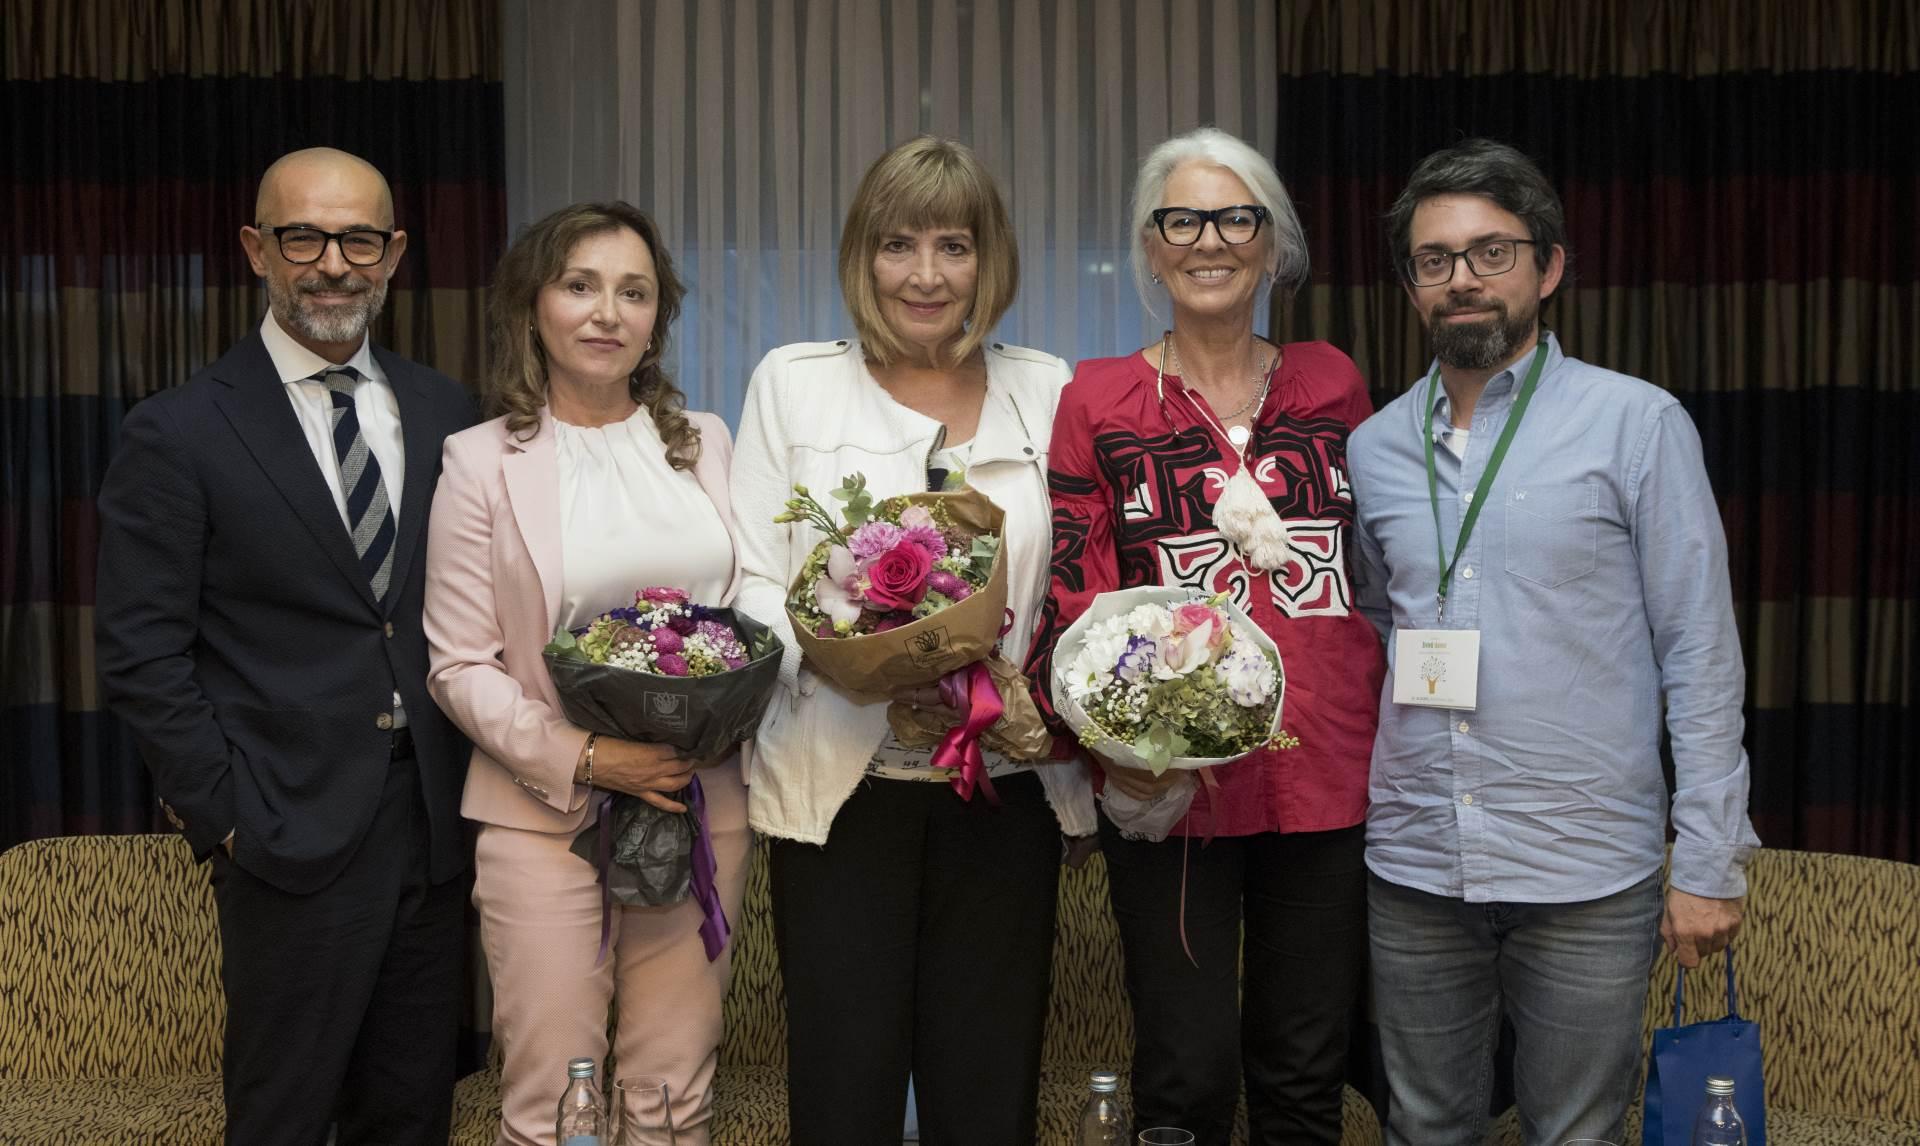 Siniša Glumičić, Sanja Gregurić, Sonja Šarunić, Zvončica Vučković i Matija Sinković